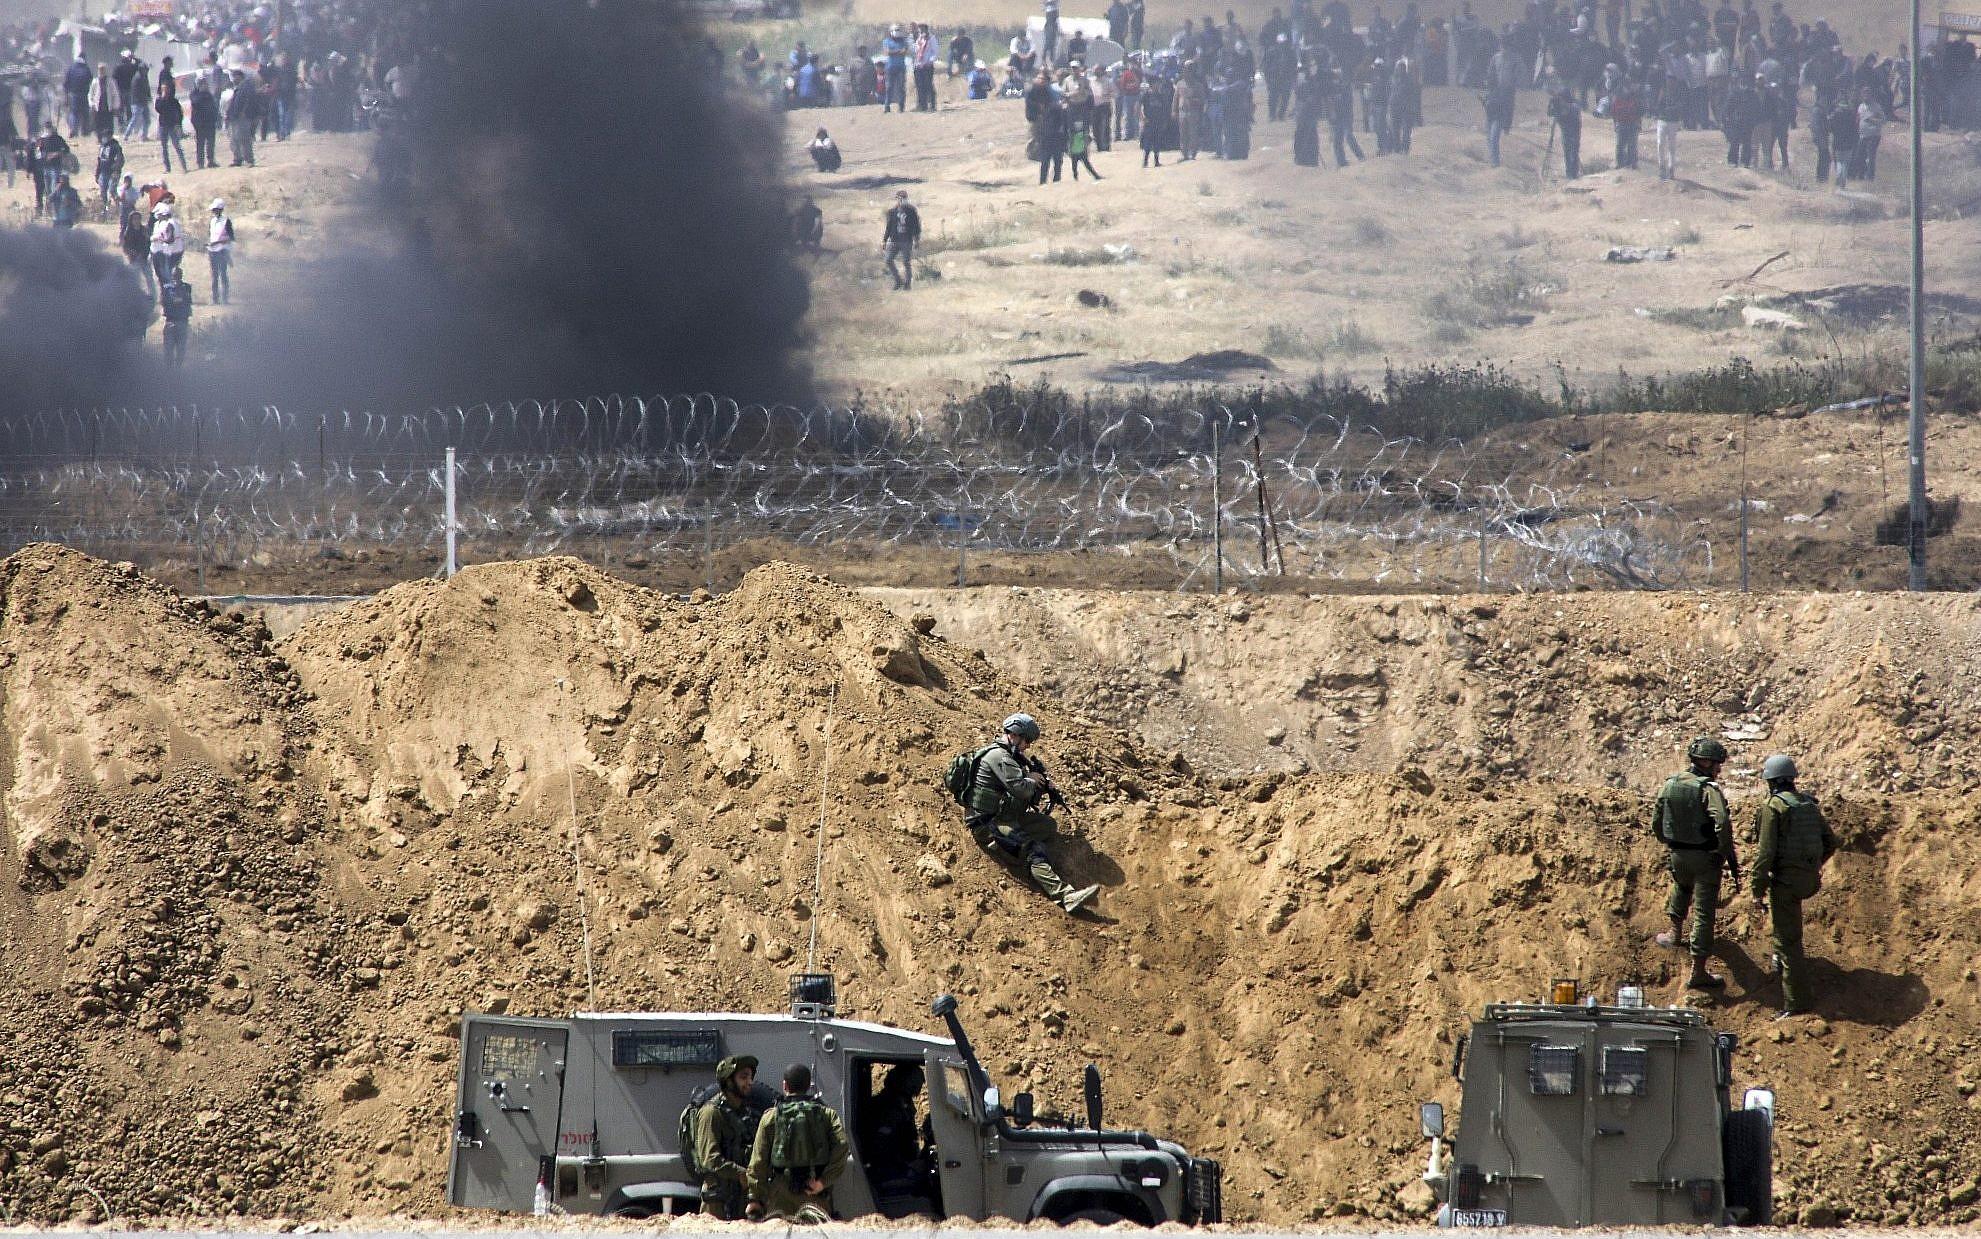 IDF Twitter Publicity Stunt Over Gaza Situation Backfires